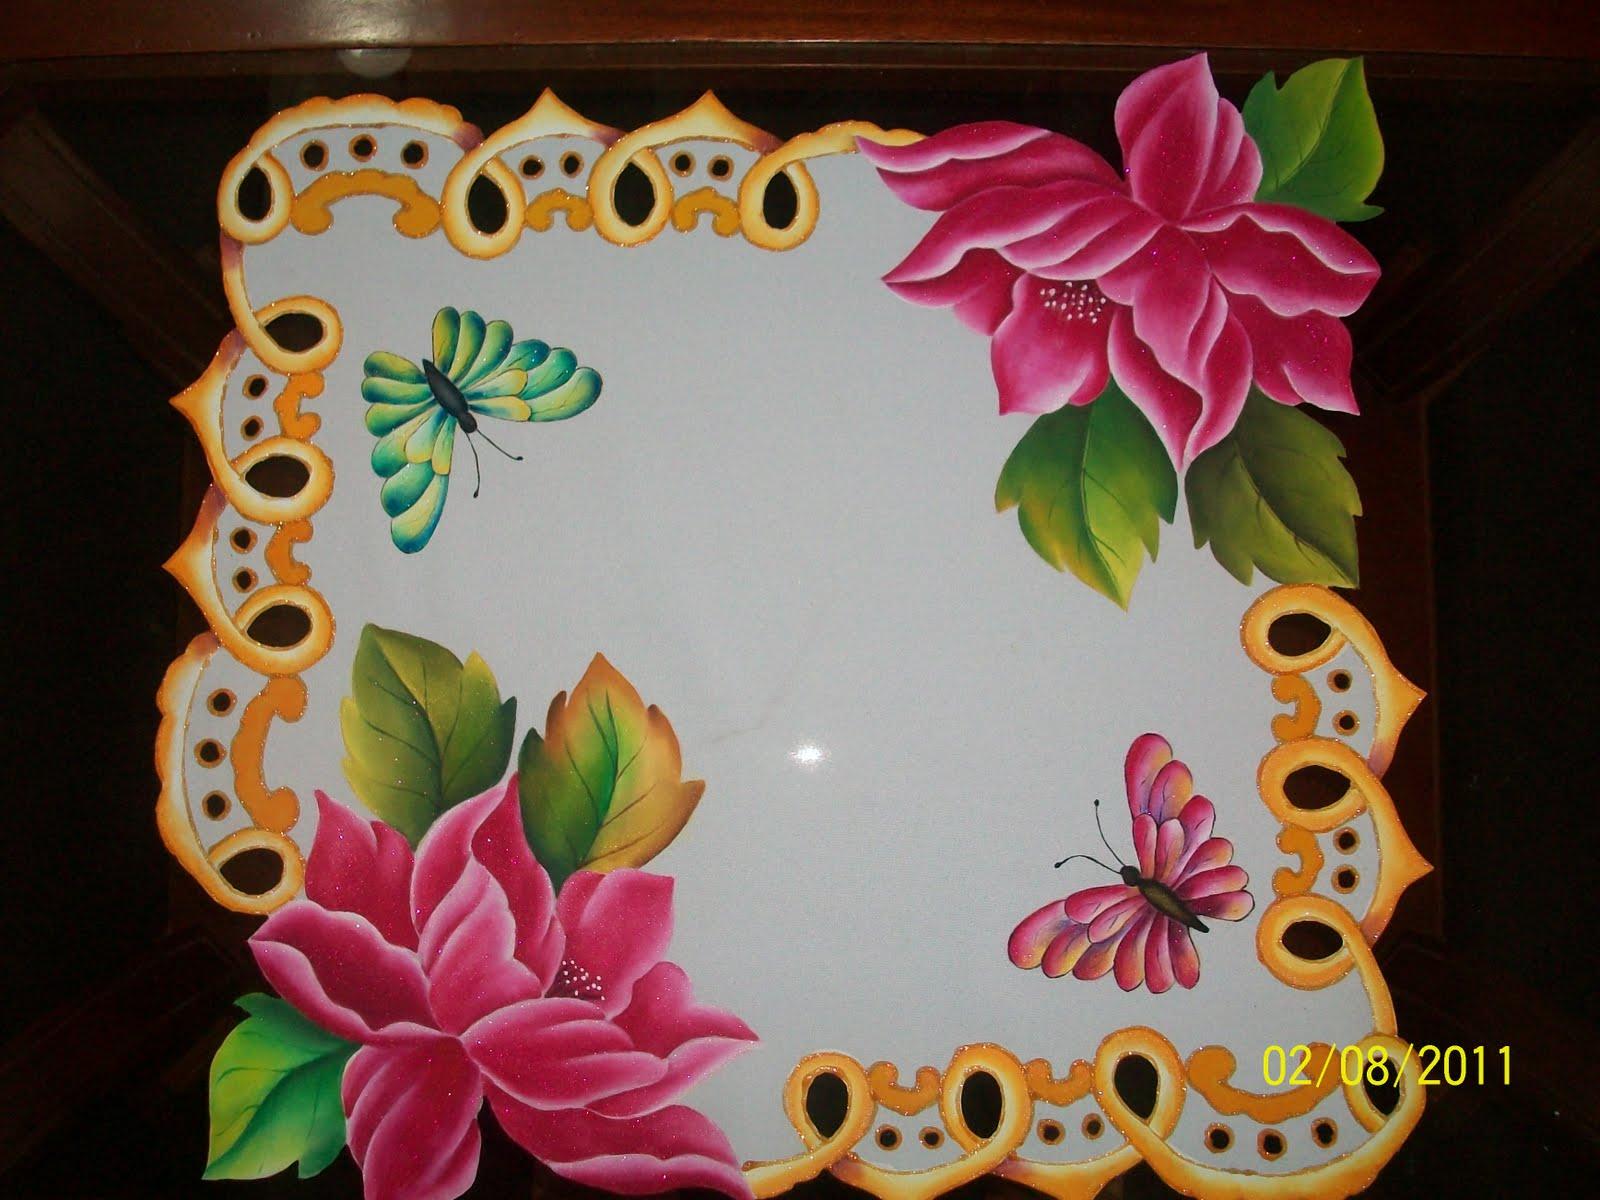 Amararte manualidades pintura en tela carpetas cuadros - Pintura en tela dibujos ...